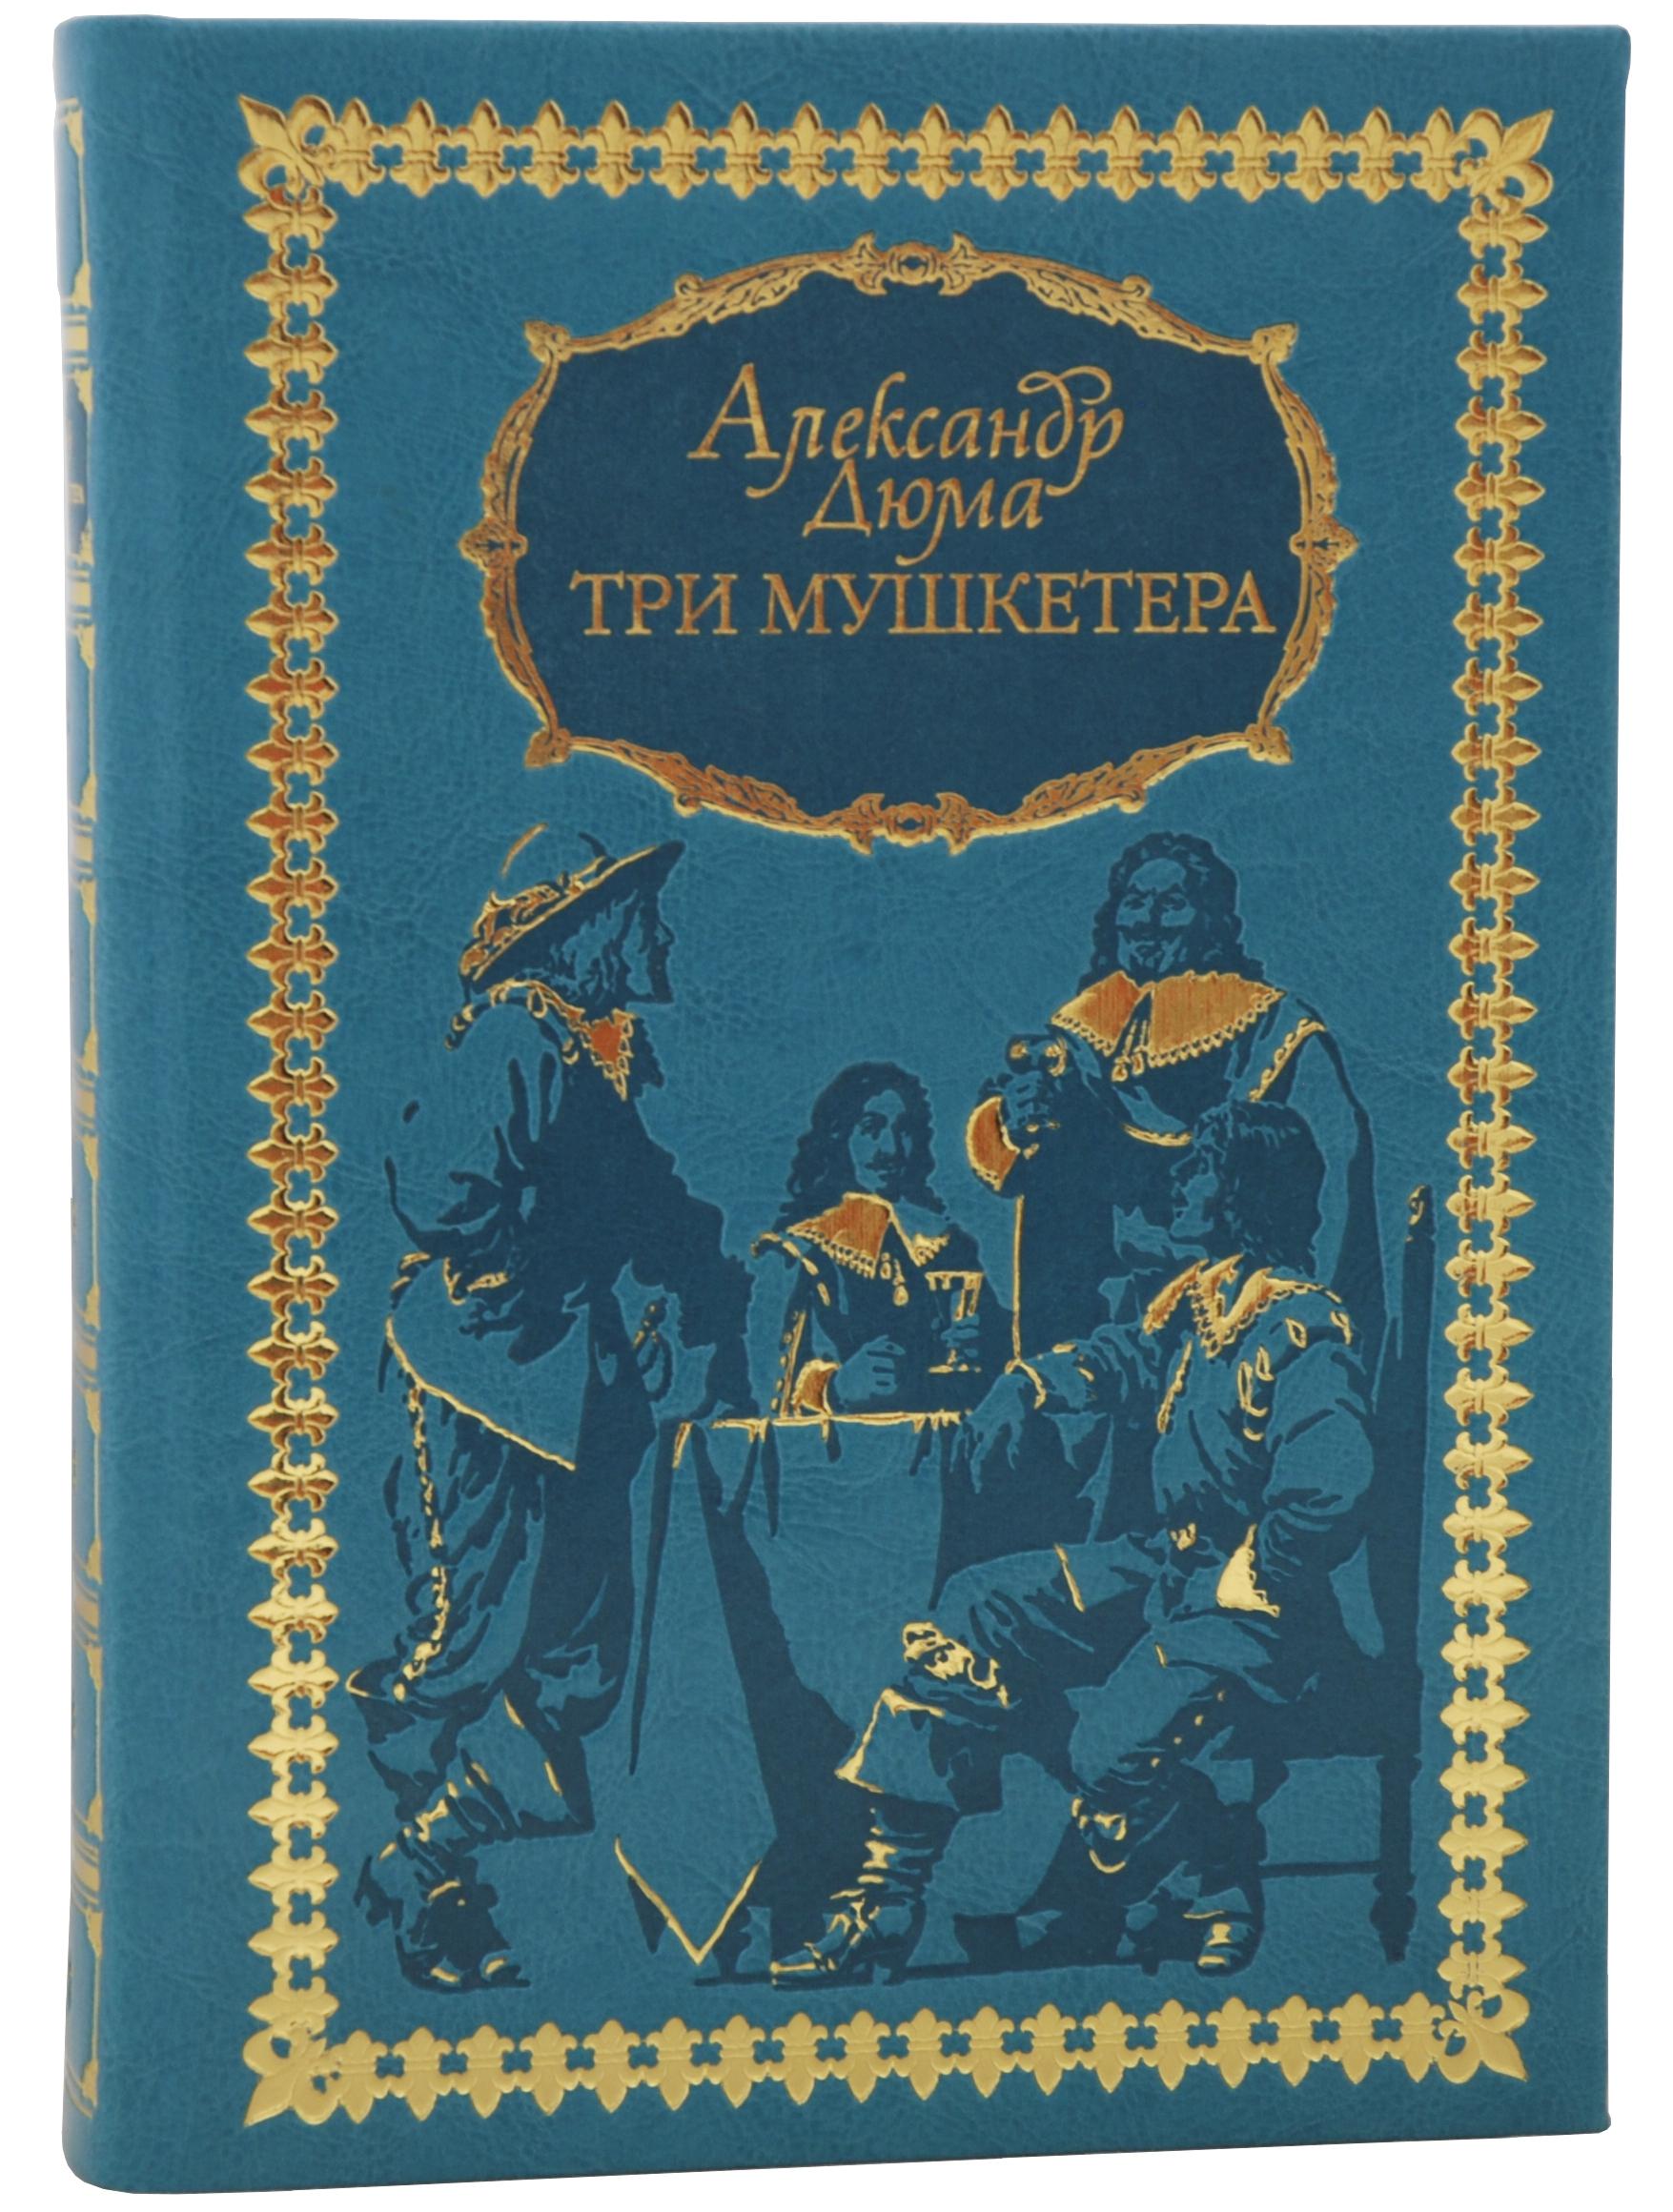 Сколько страниц в романе дюма три мушкетера 23 фотография